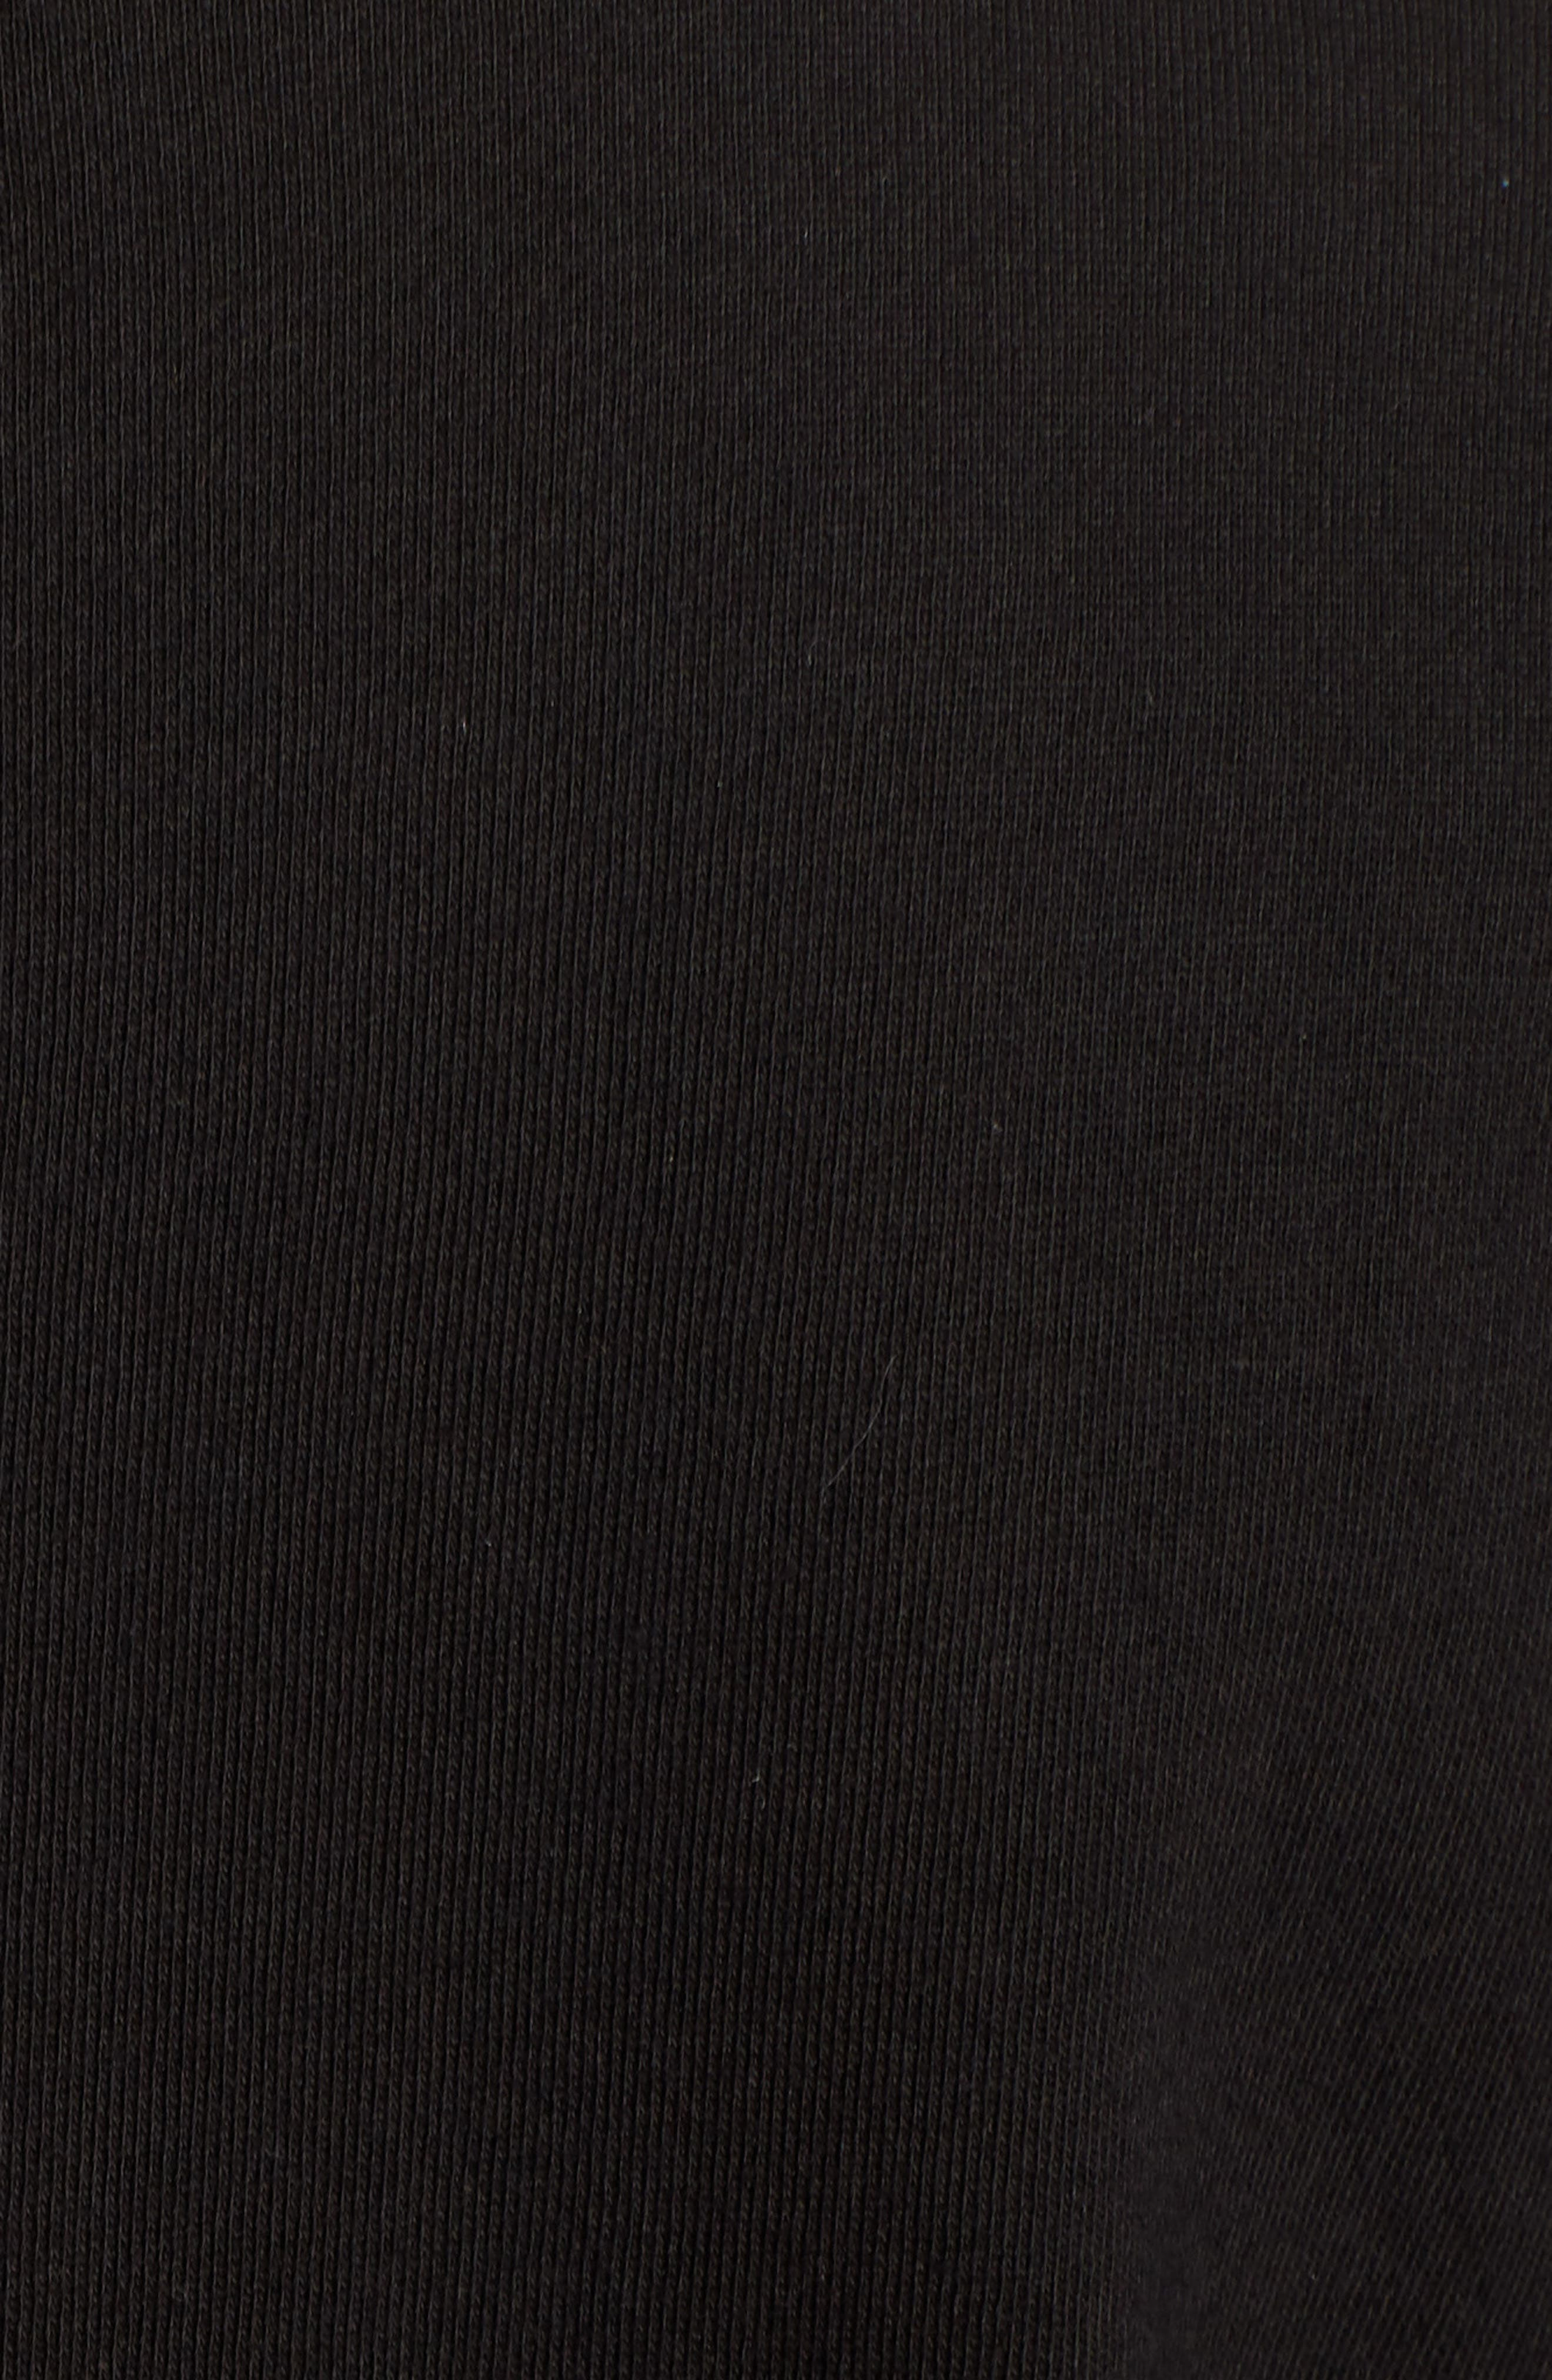 Cotton Blend Knit Blazer,                             Alternate thumbnail 6, color,                             001